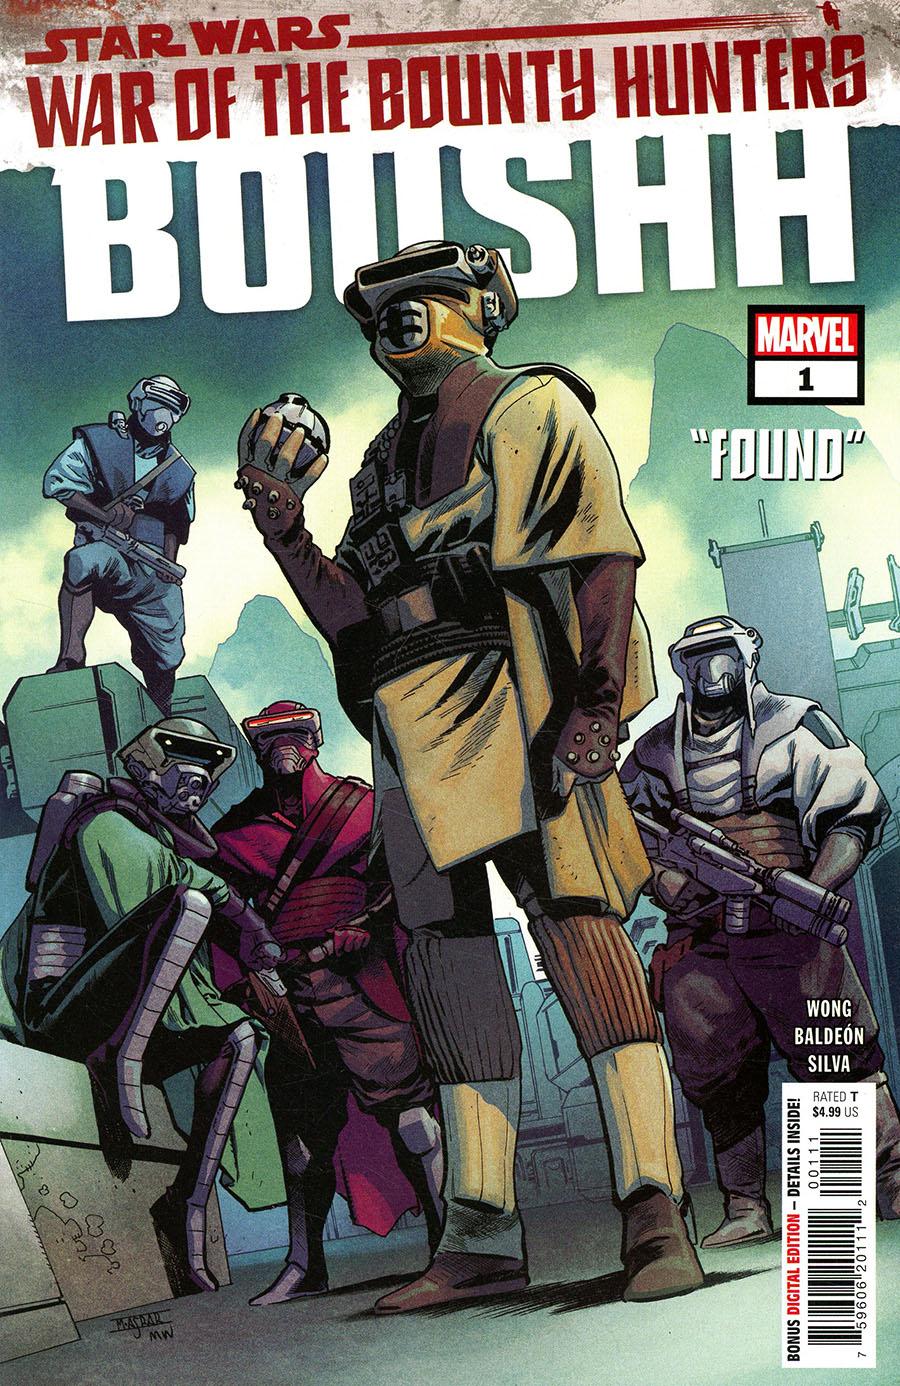 Star Wars War Of The Bounty Hunters Boushh #1 (One Shot) Cover A Regular Mahmud Asrar Cover